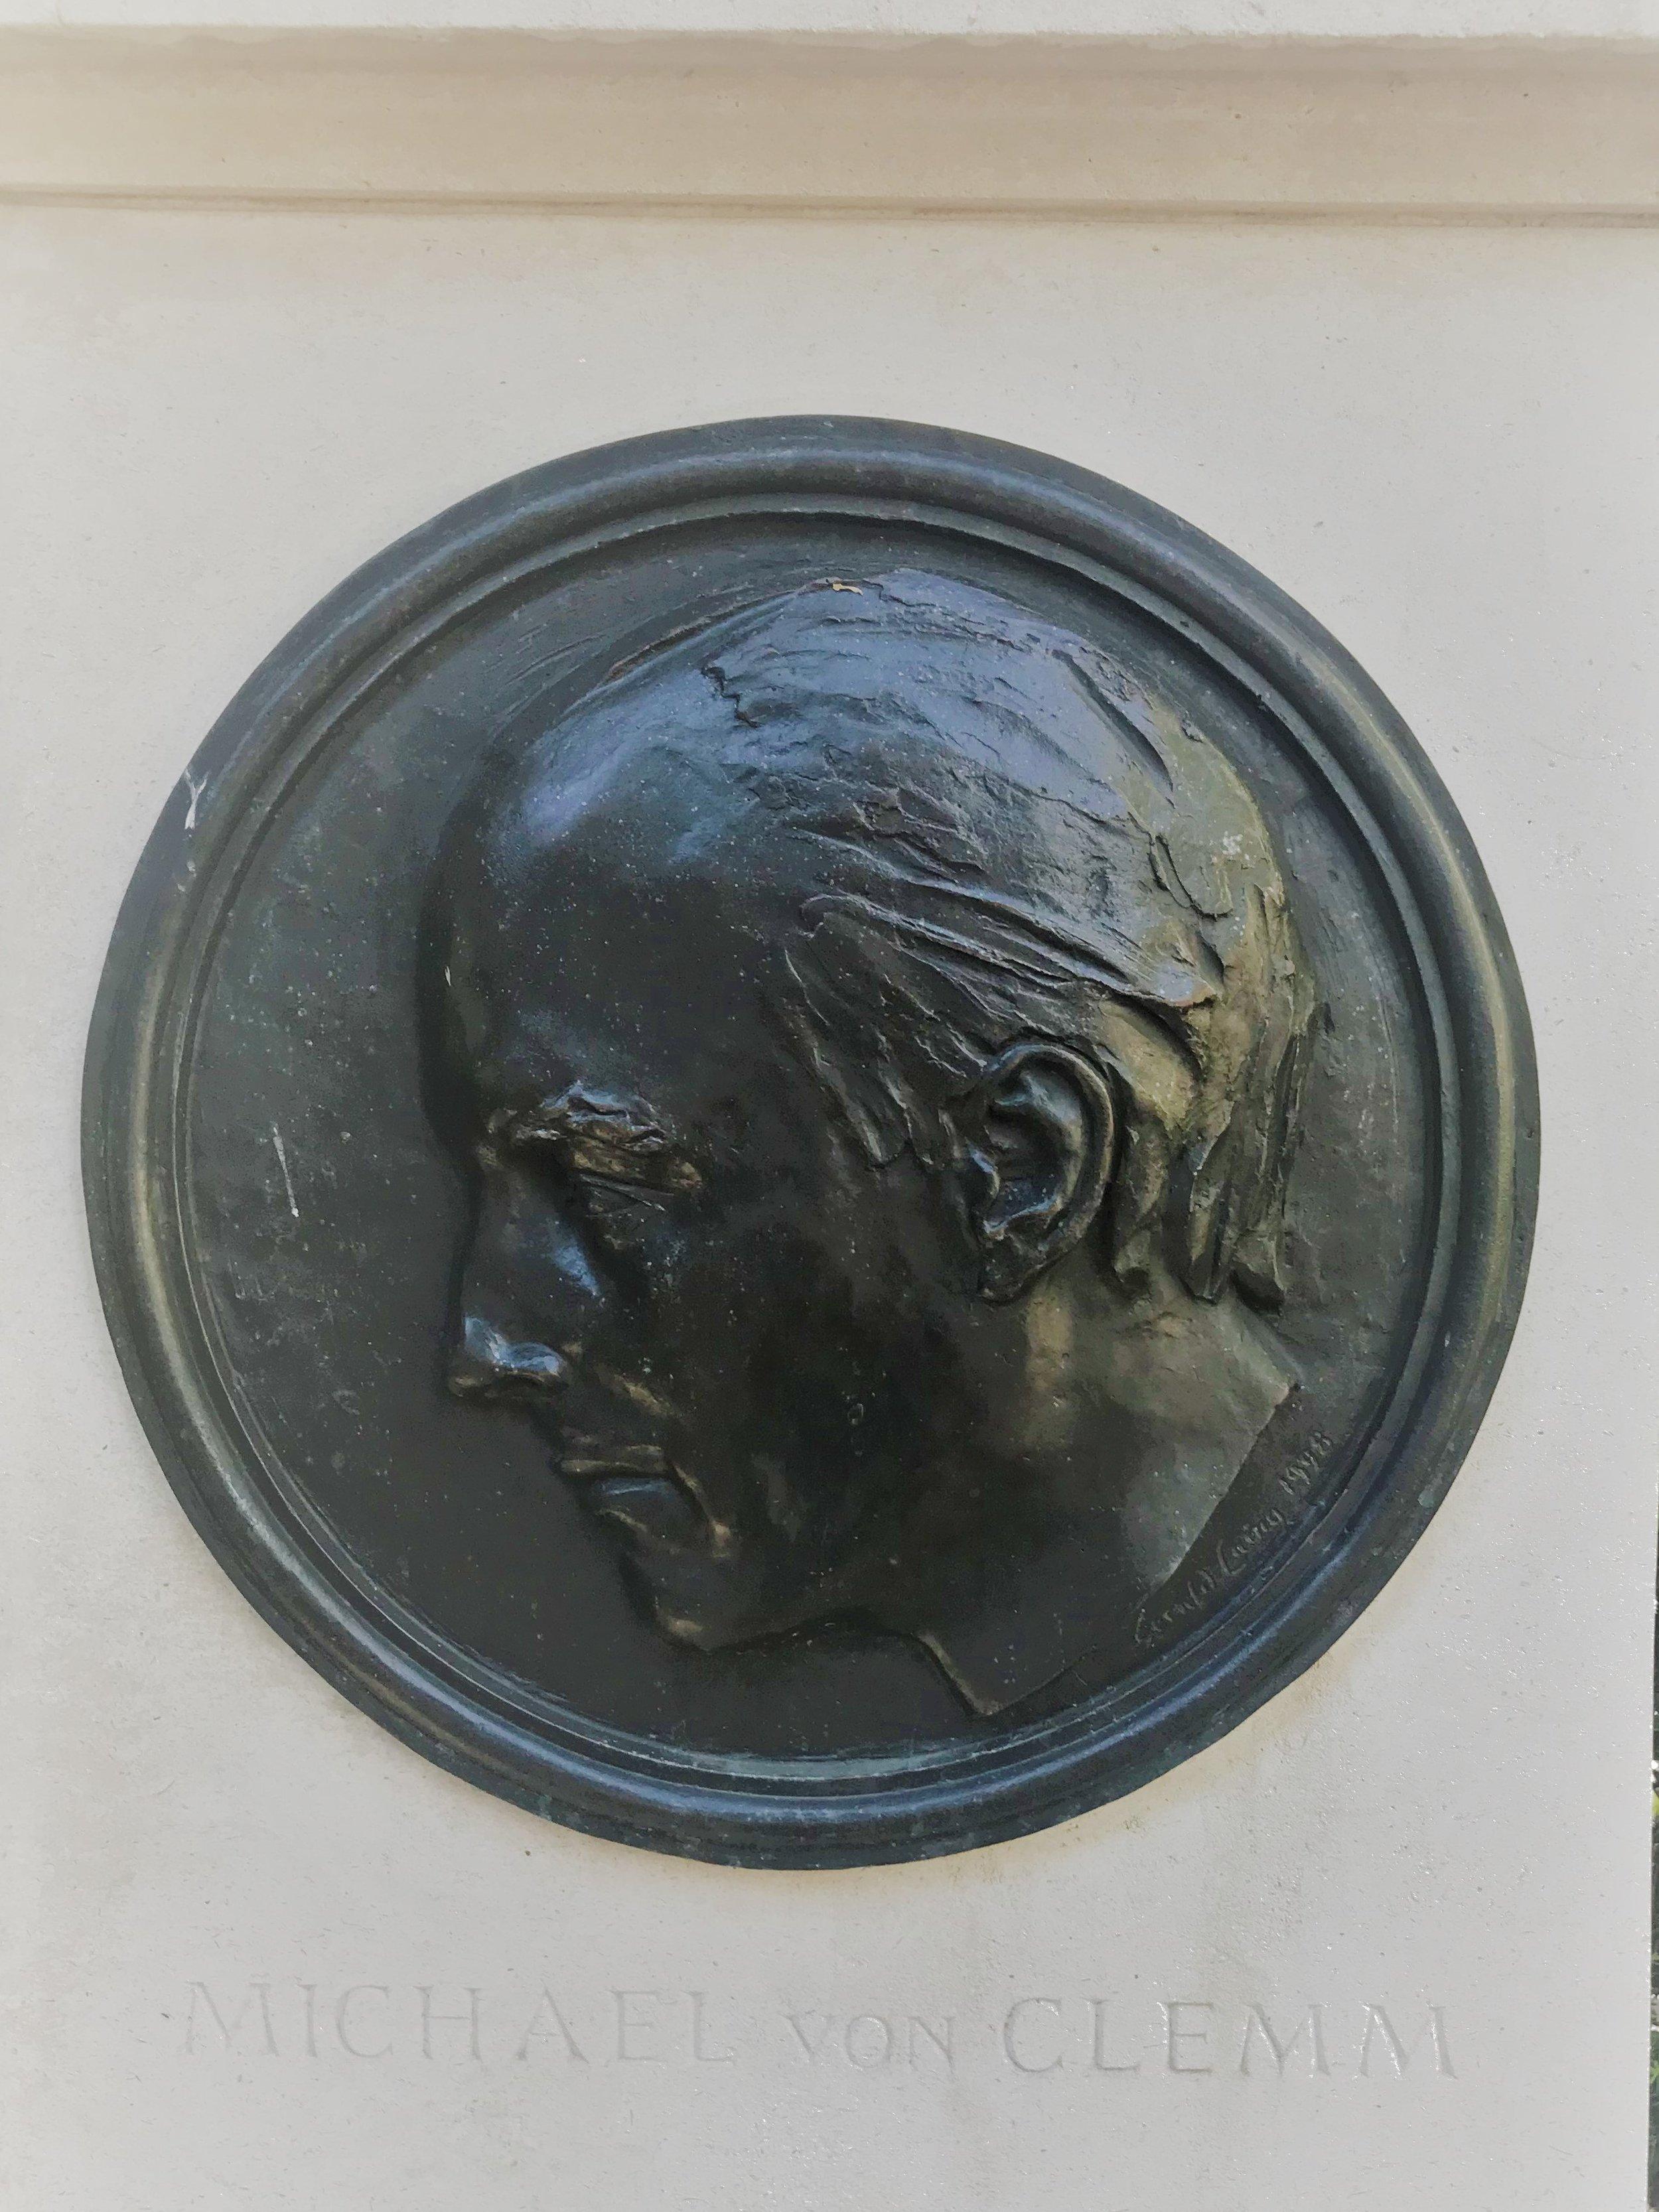 von Clemm memorial, Cabot Square